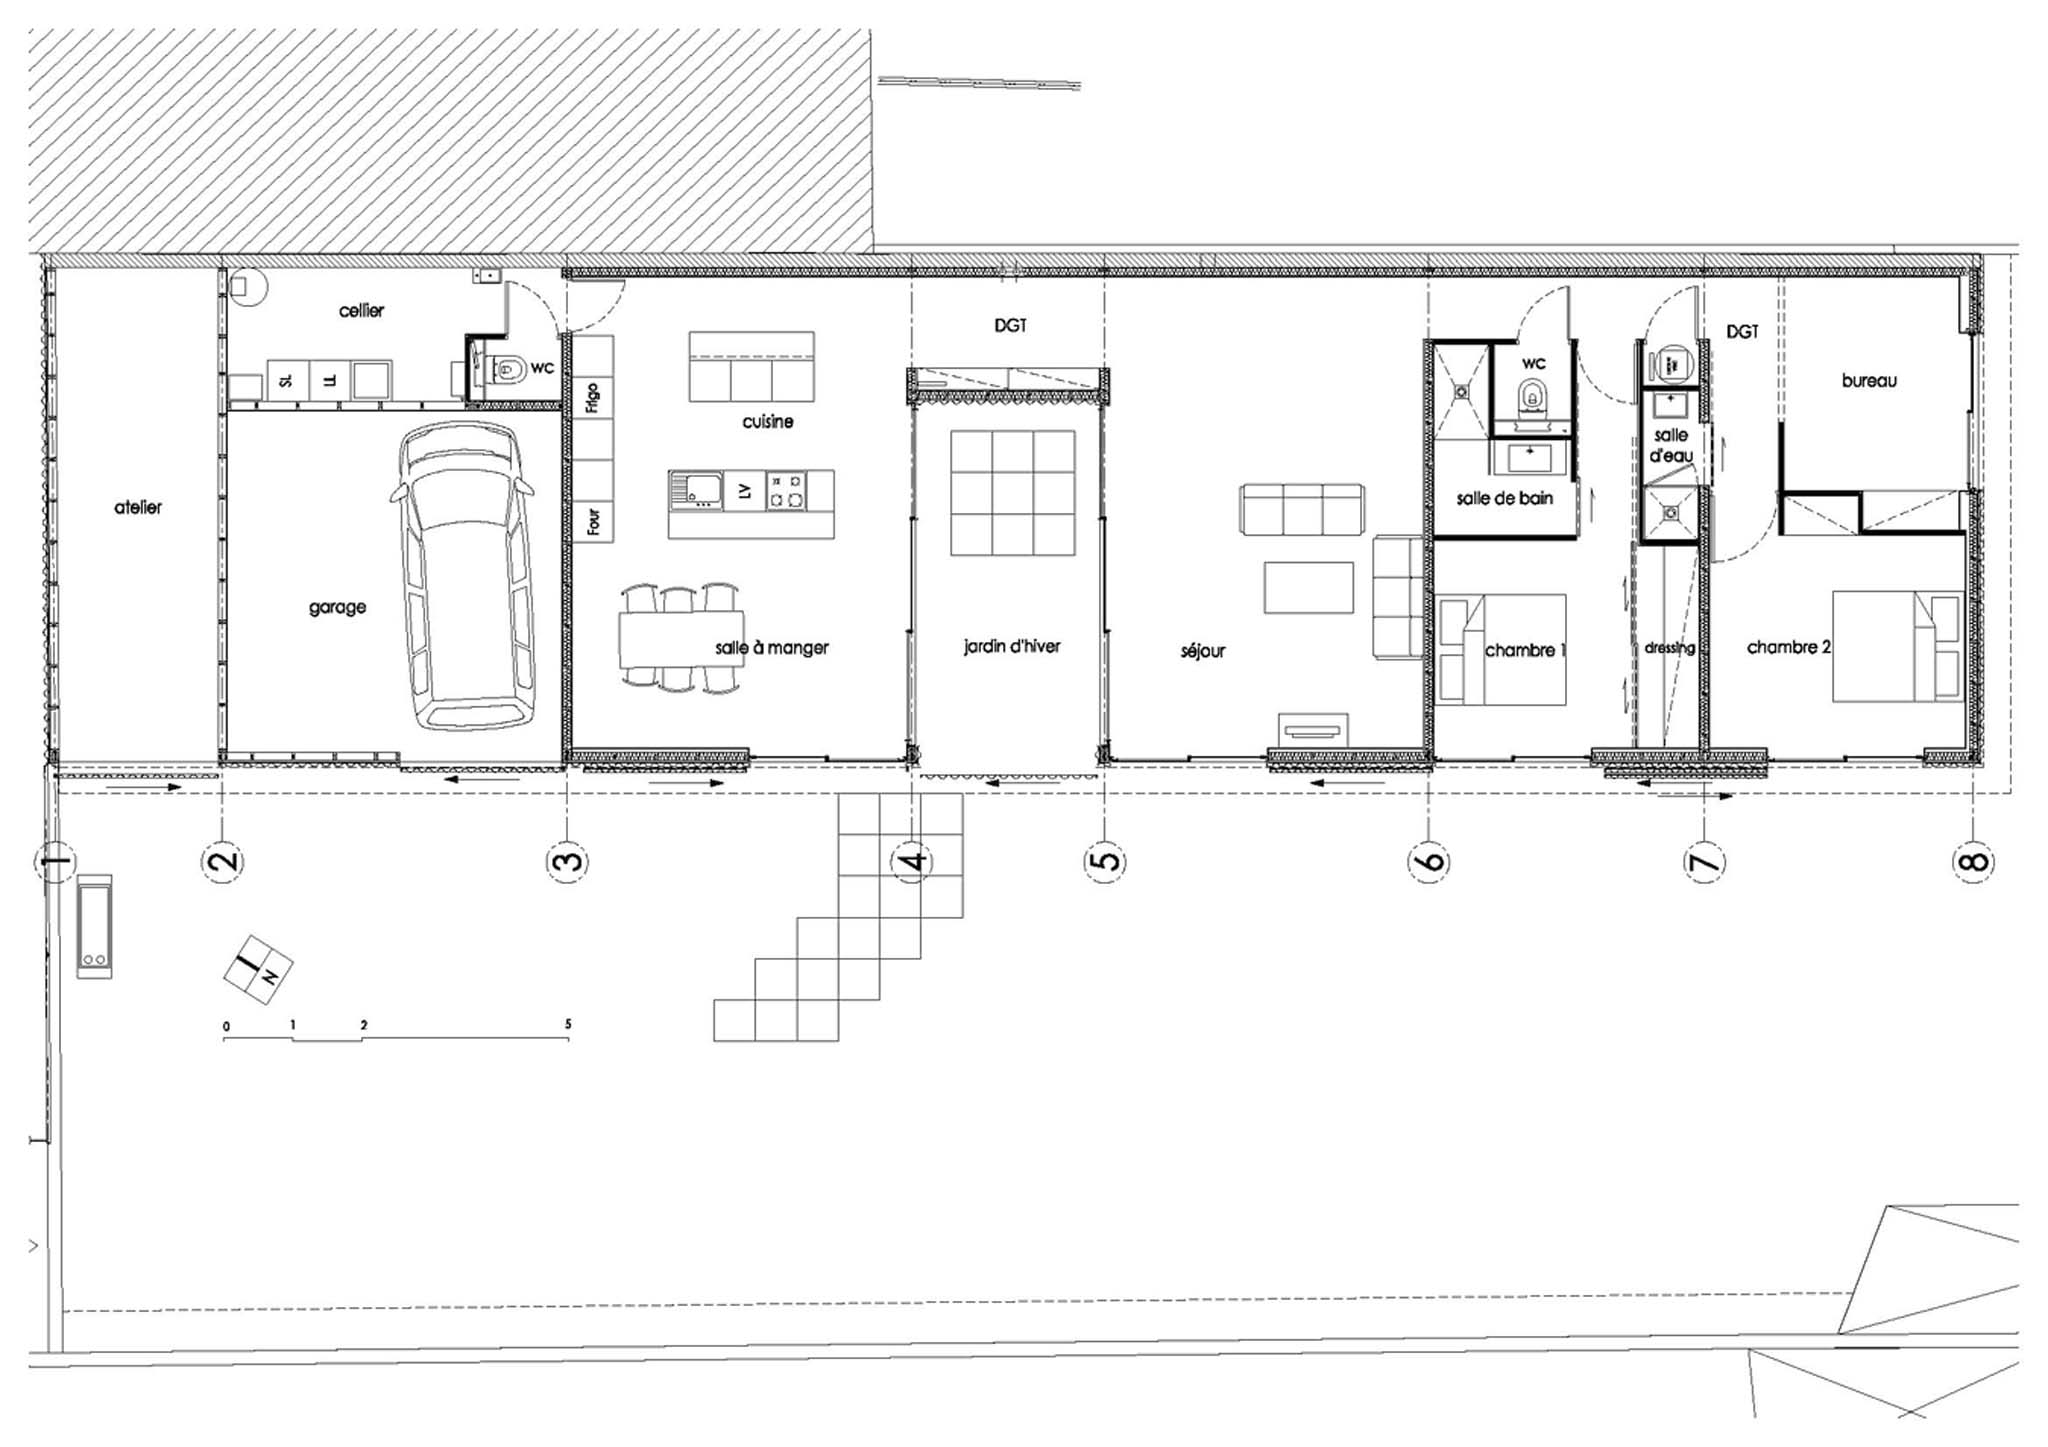 Maison en u plan plan maison moderne en u plan architecte for Plan de maison en u